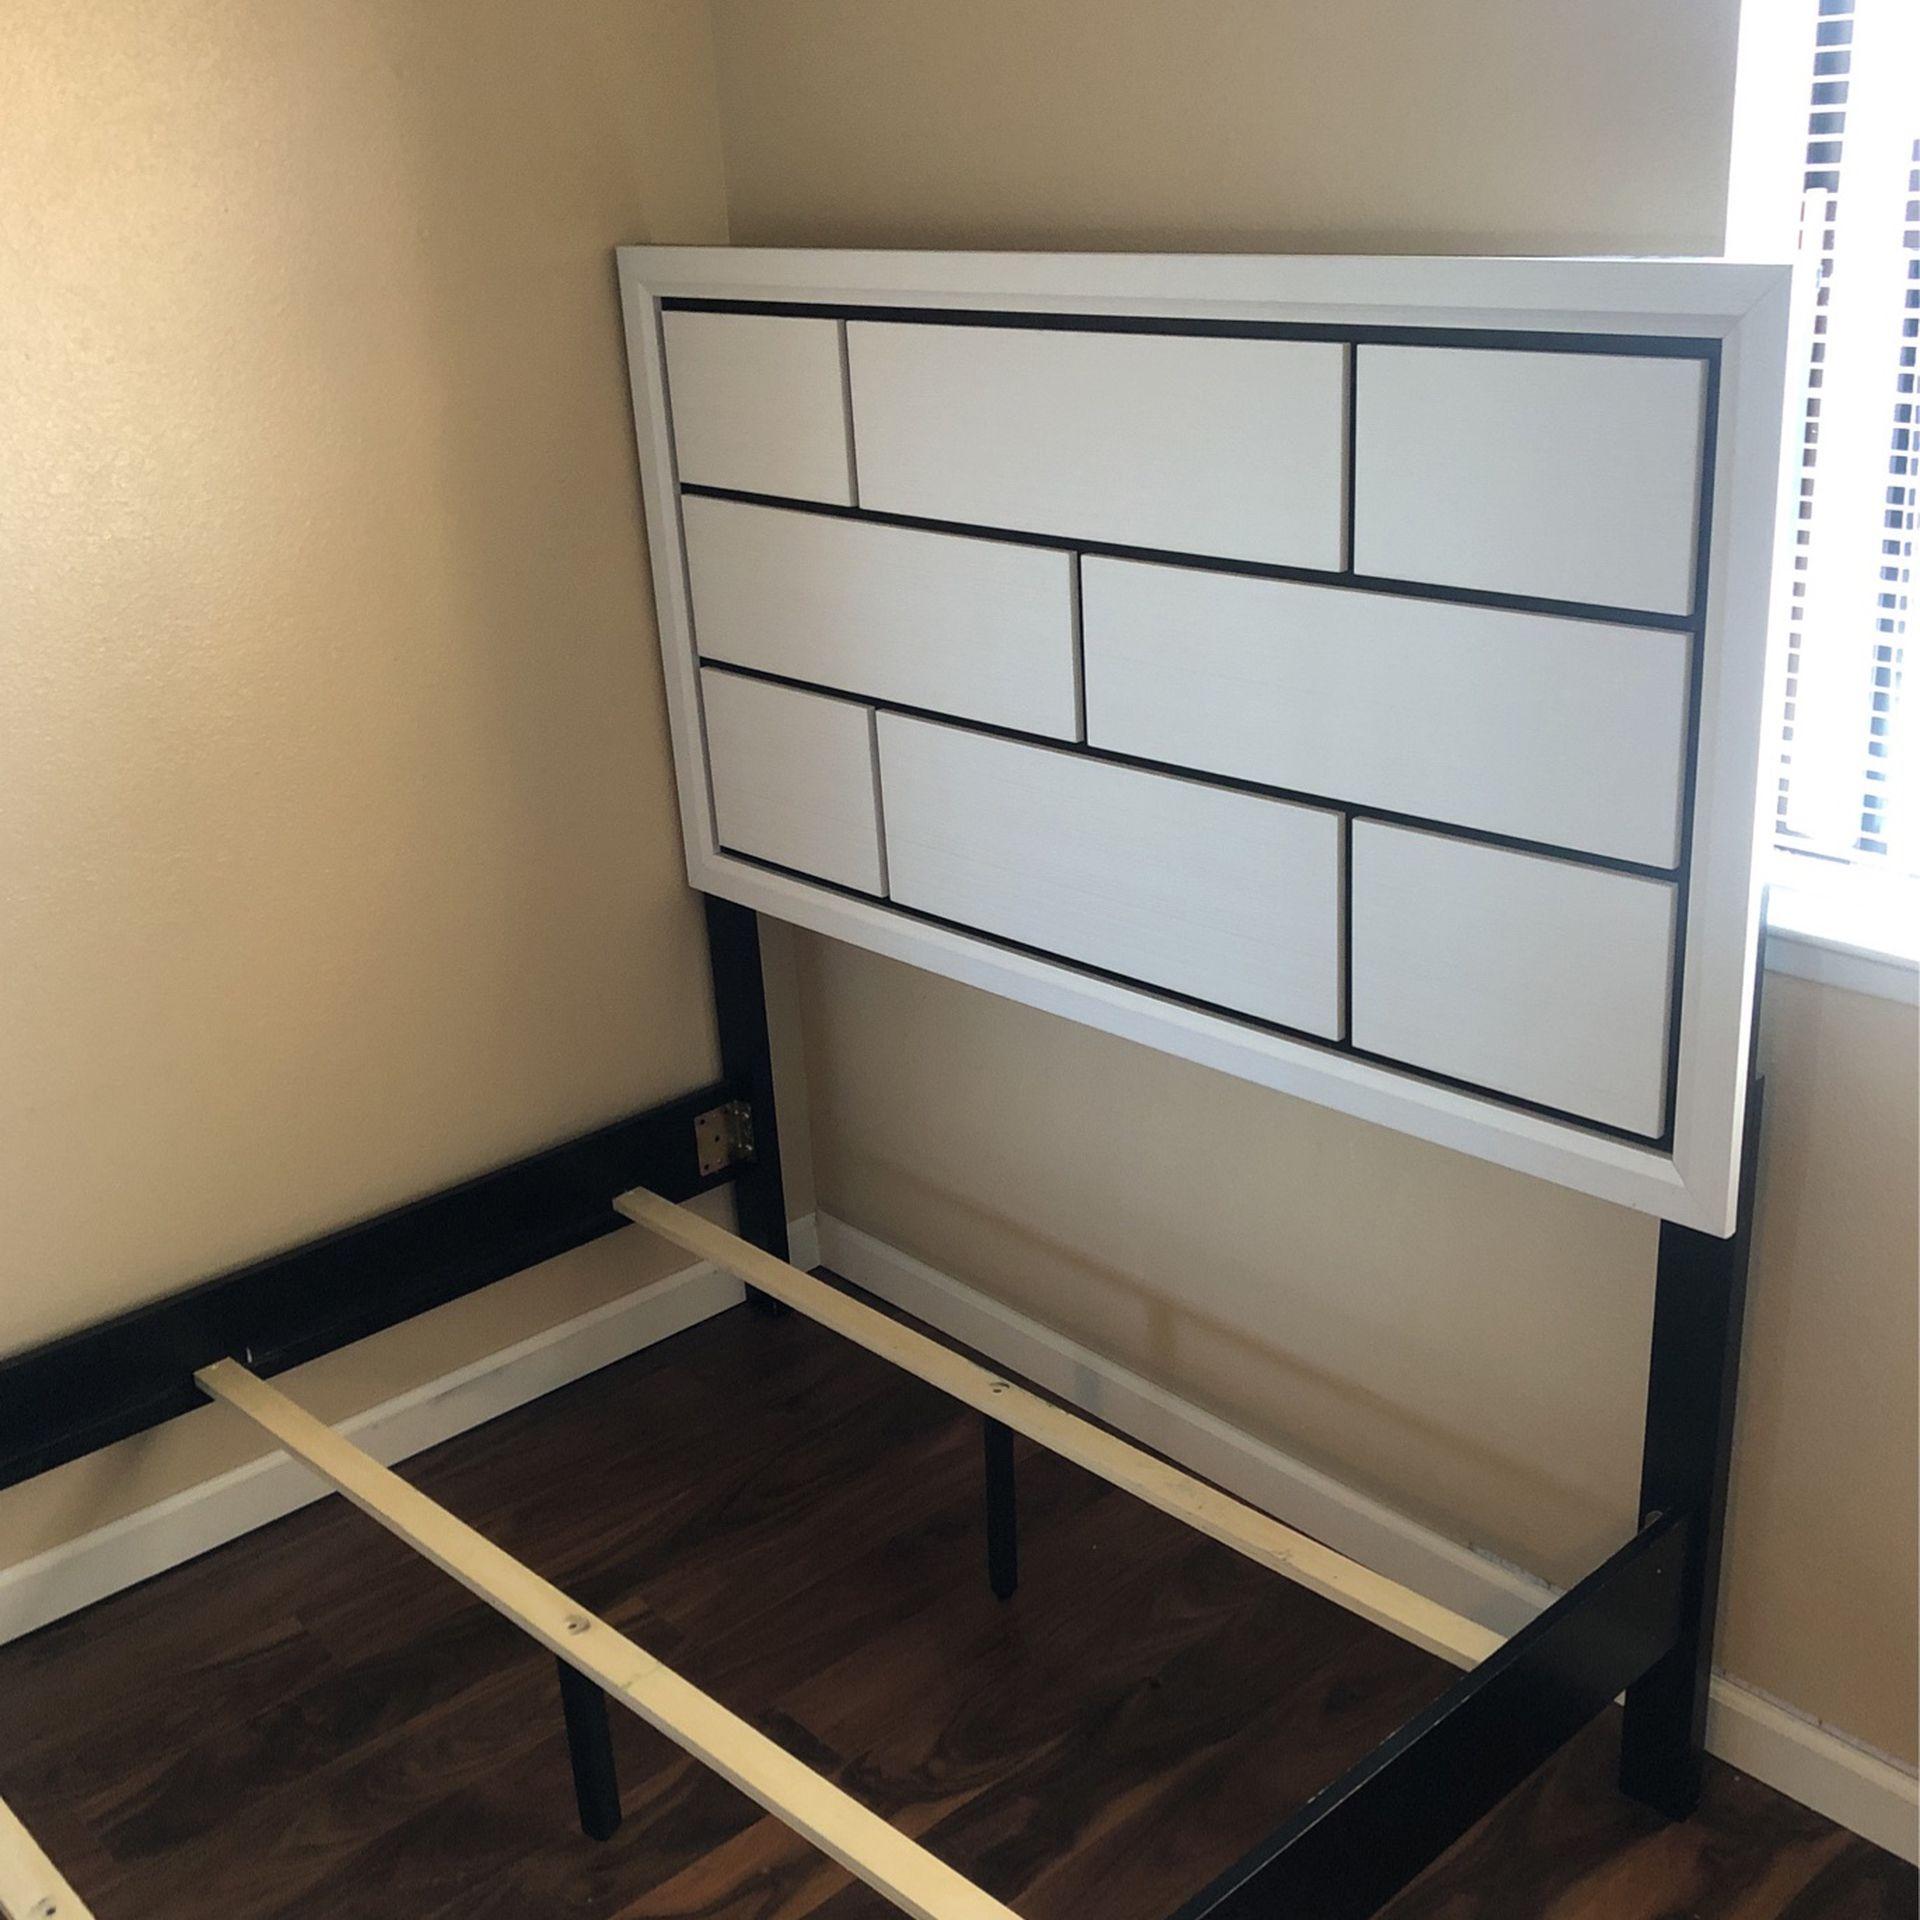 Bed Set Size FULL